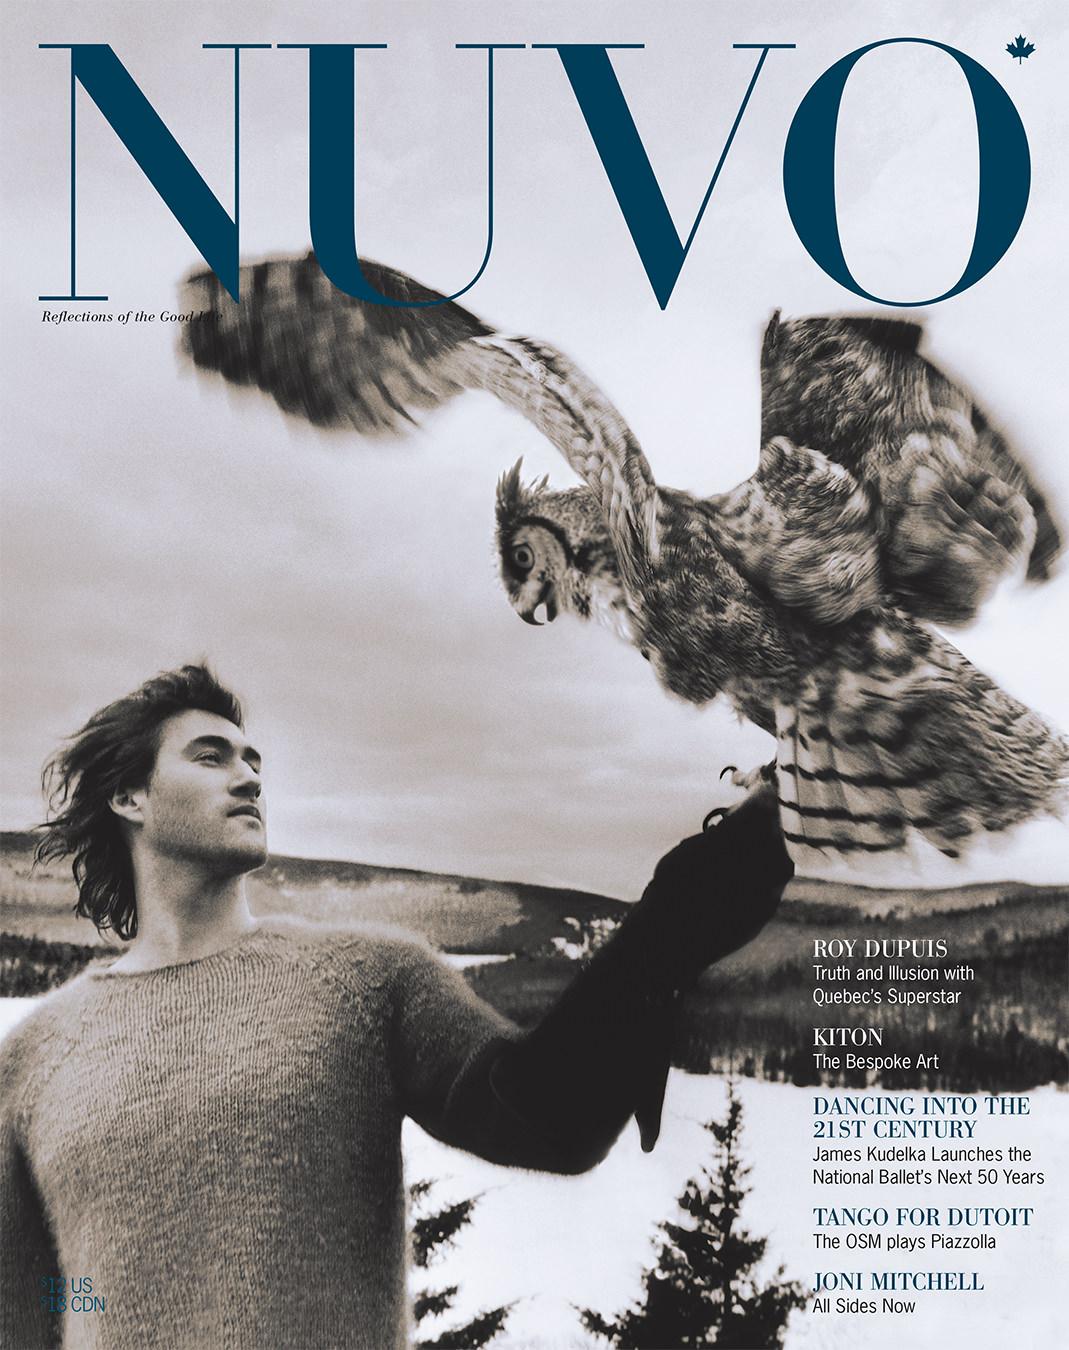 NUVO Magazine Autumn 2001 Cover featuring Roy Dupuis